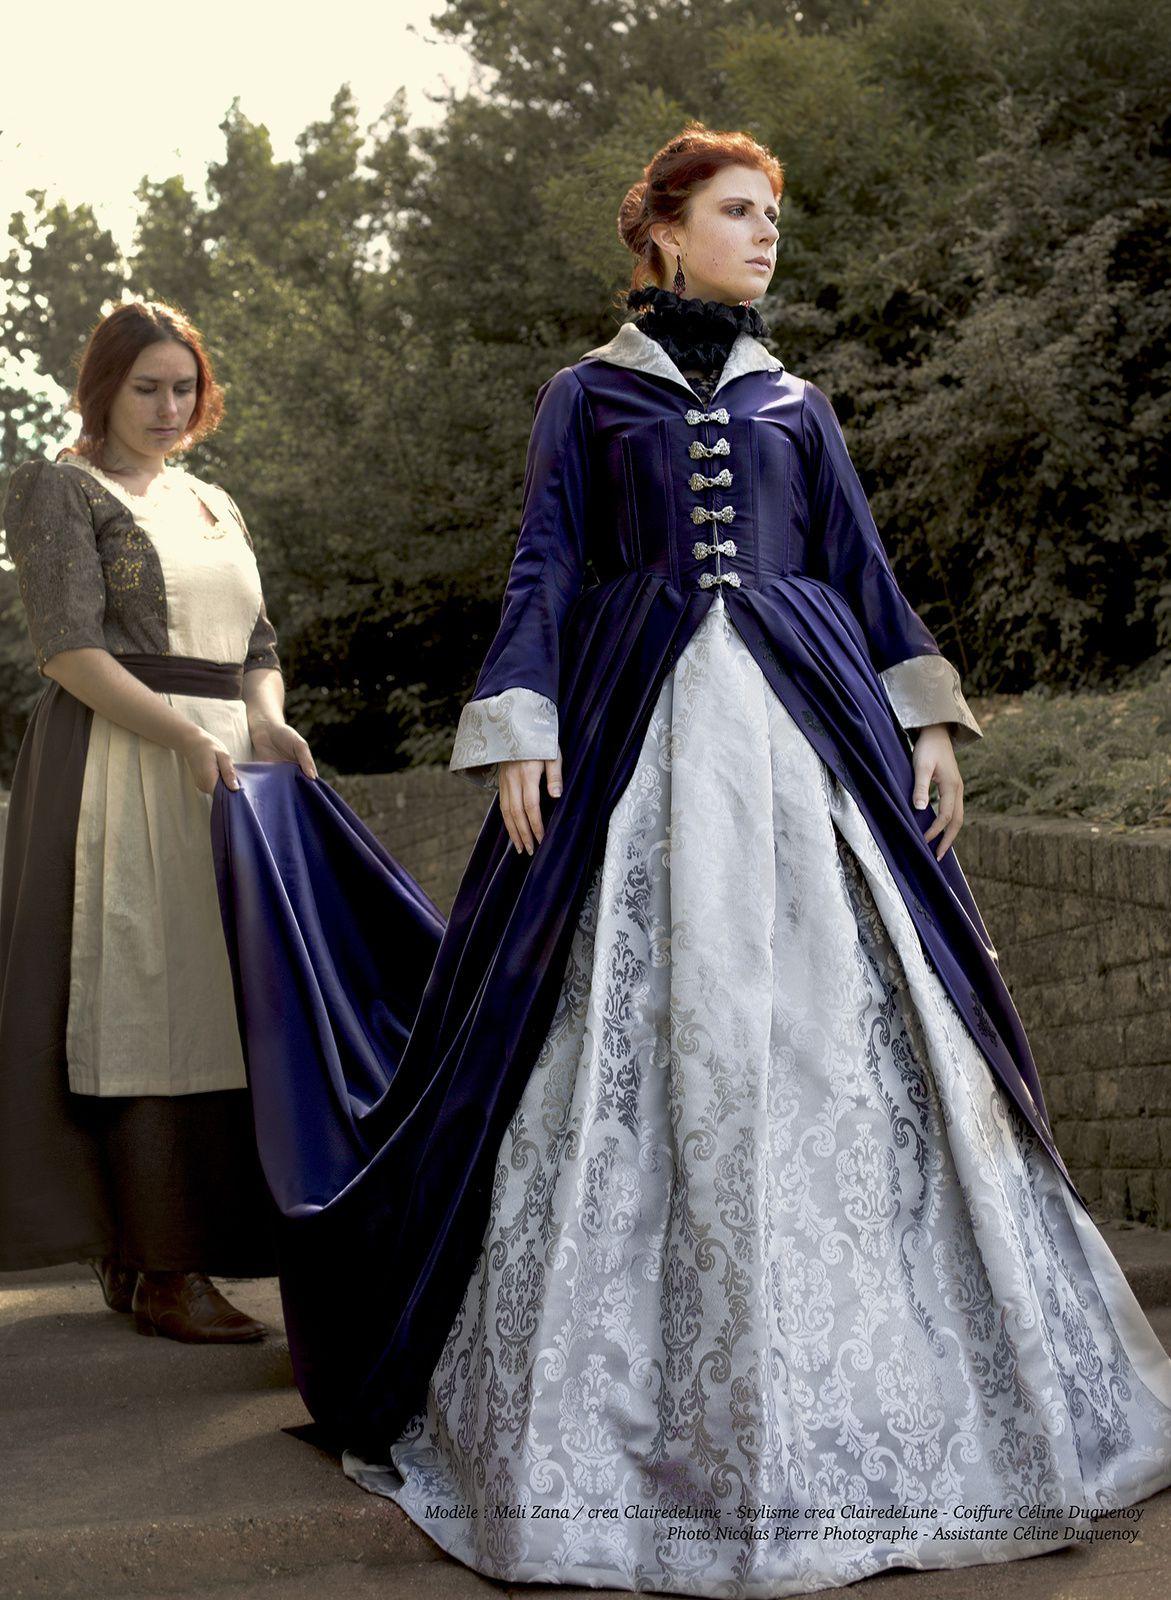 Comtesse Bathory